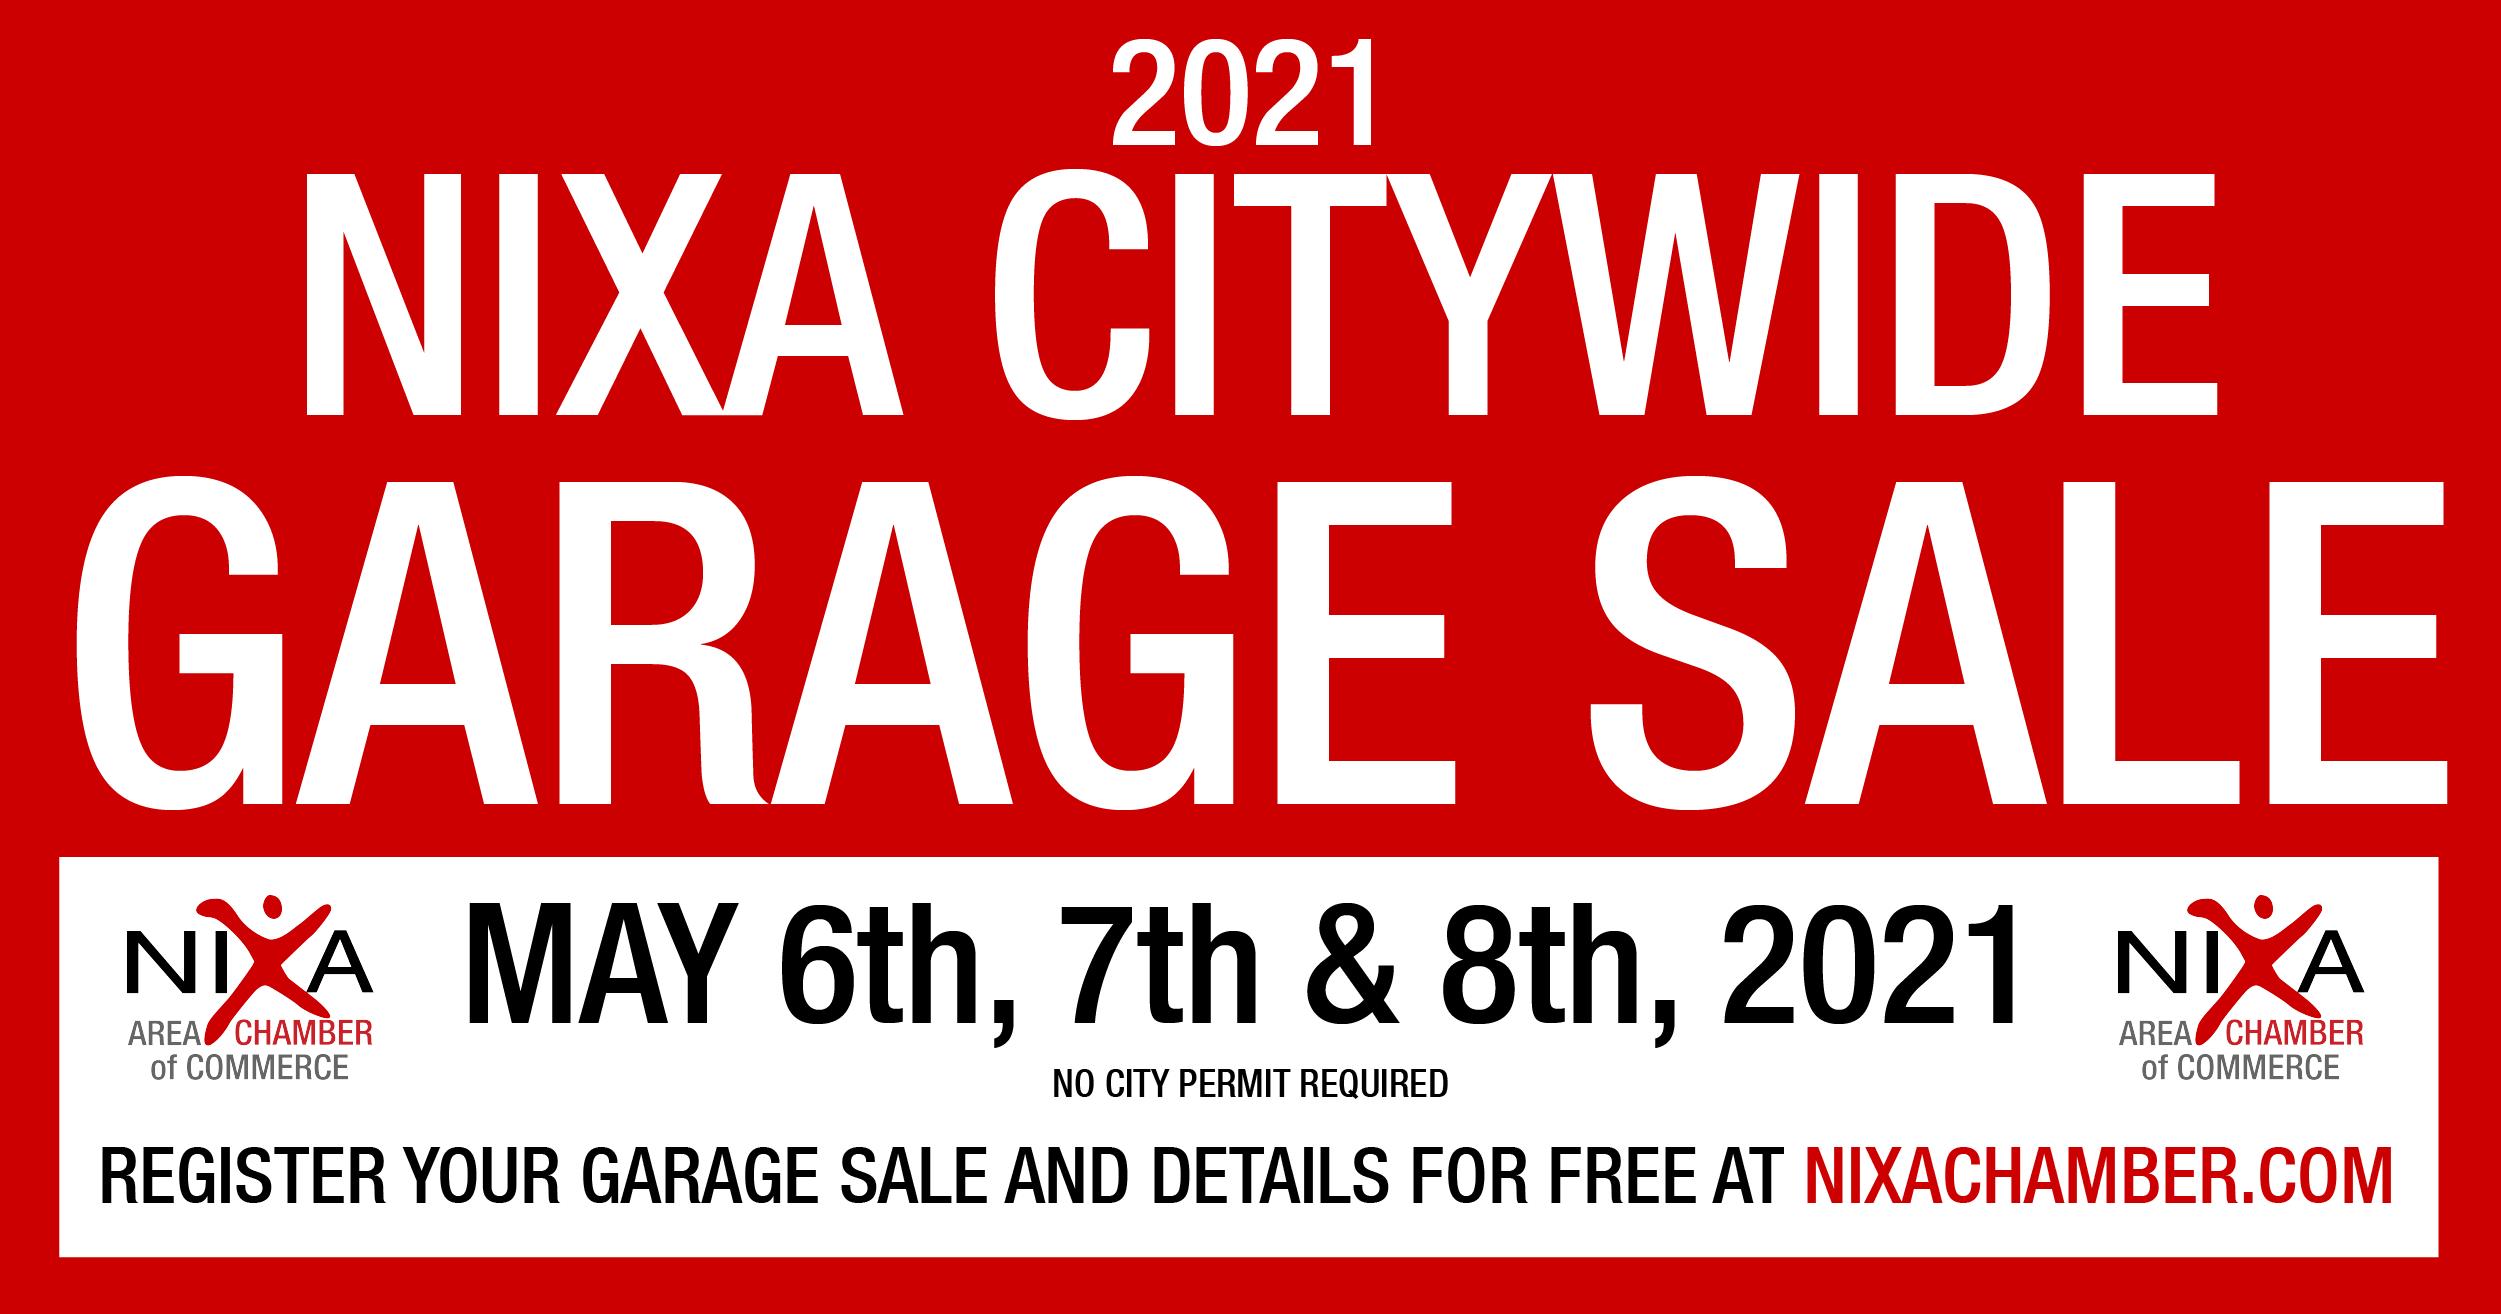 citywide garage sale event 2021